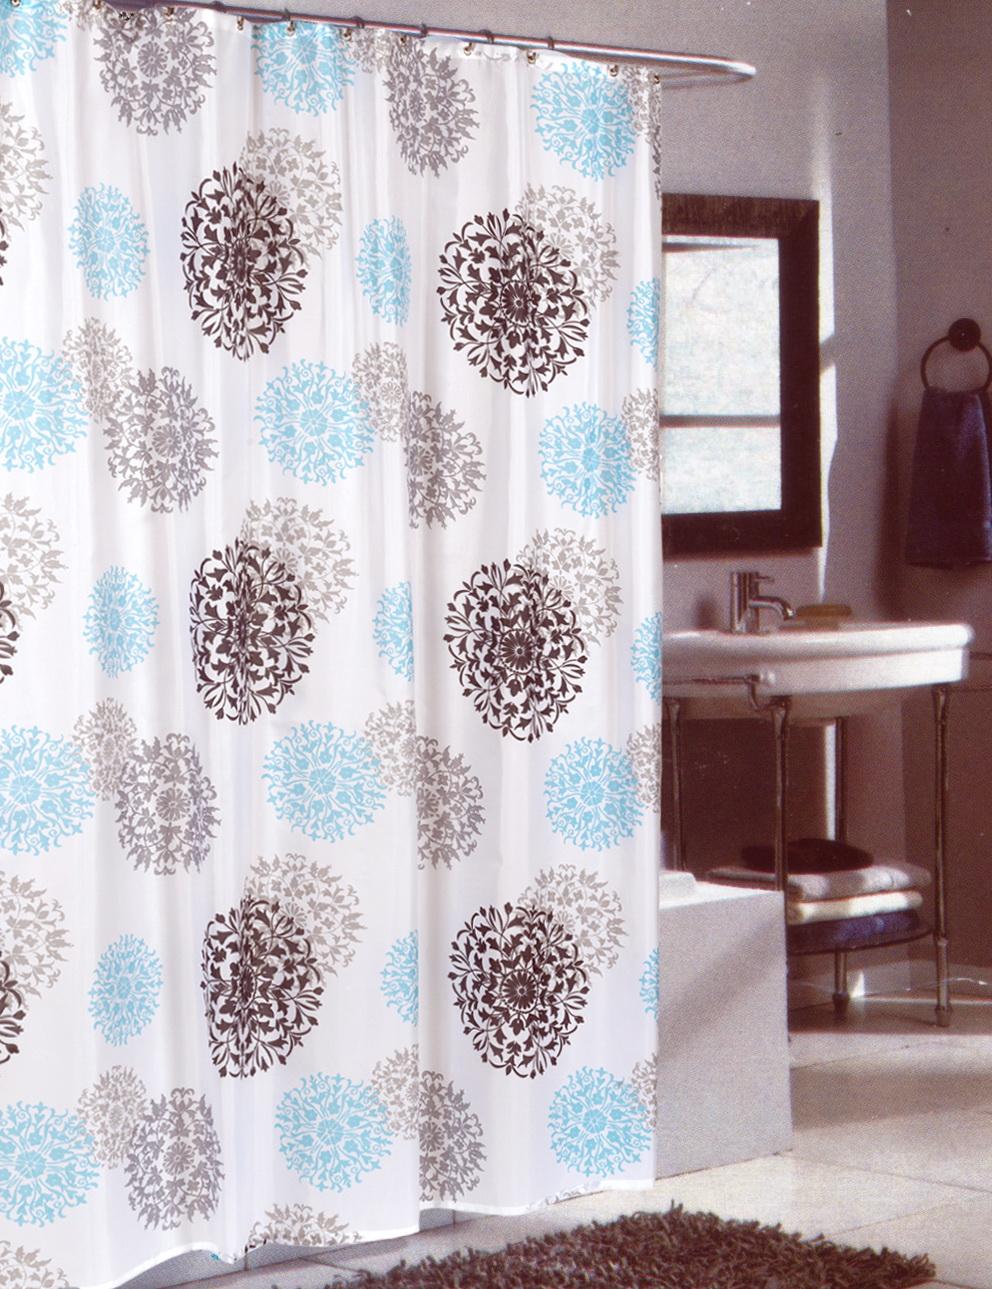 96 Inch Shower Curtain Fabric